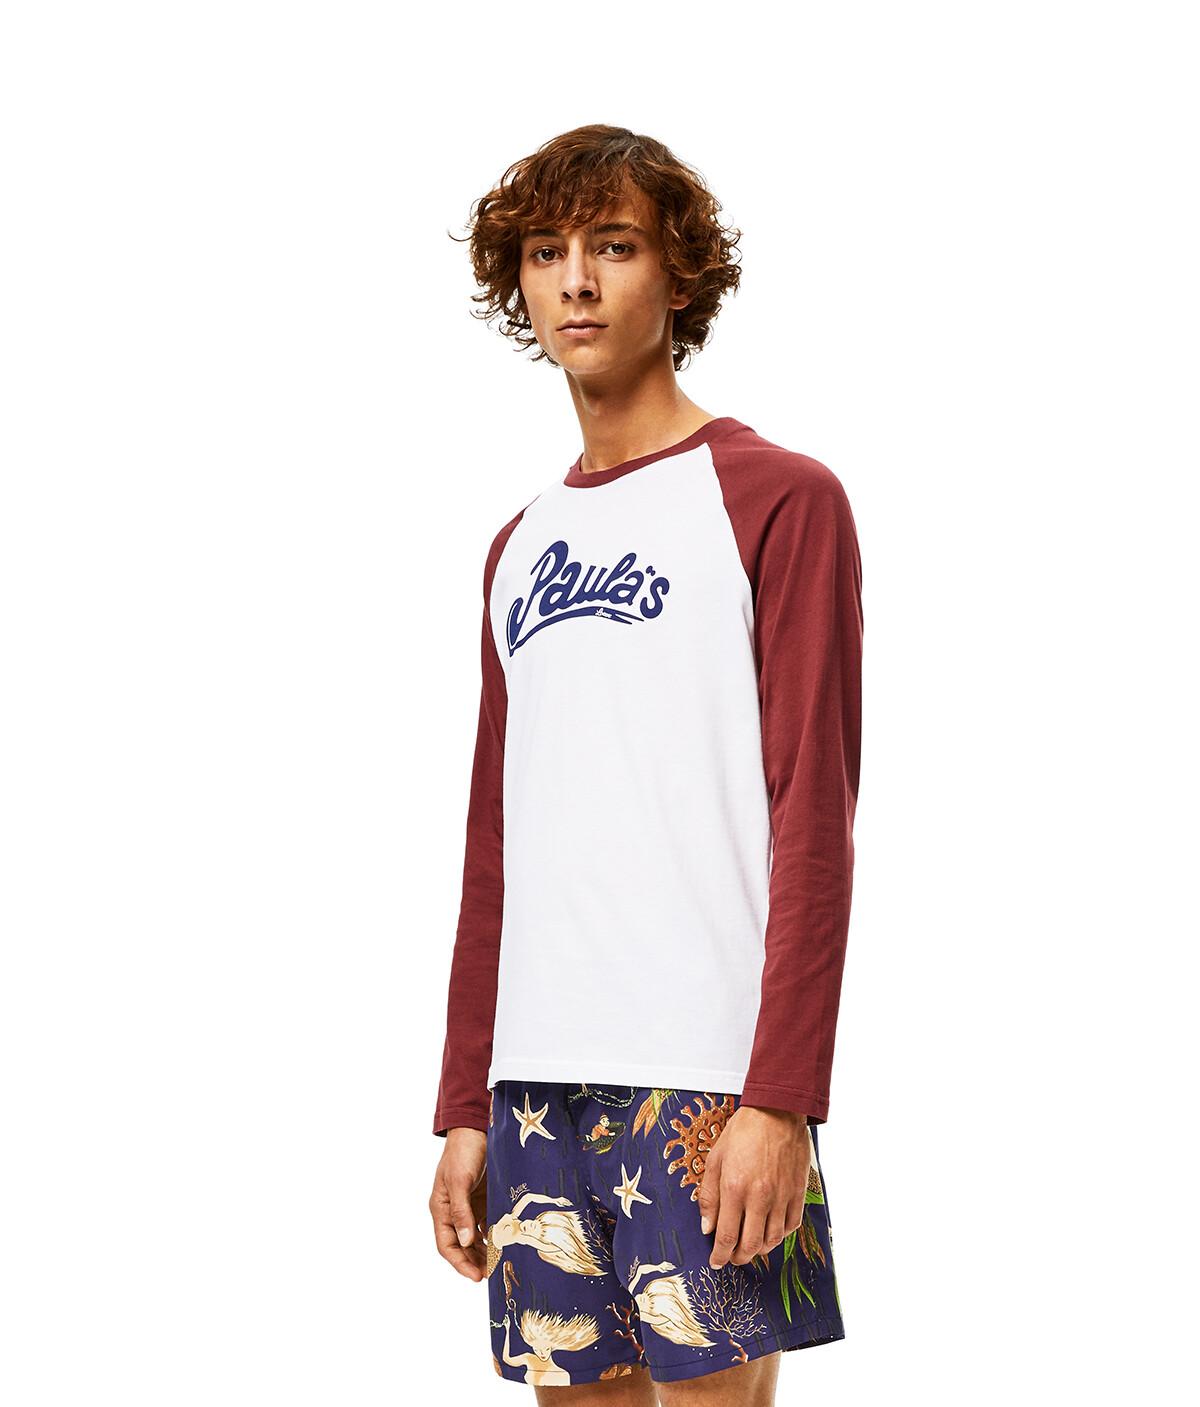 LOEWE Camiseta Tipo Béisbol De Algodón Blanco/Marron front